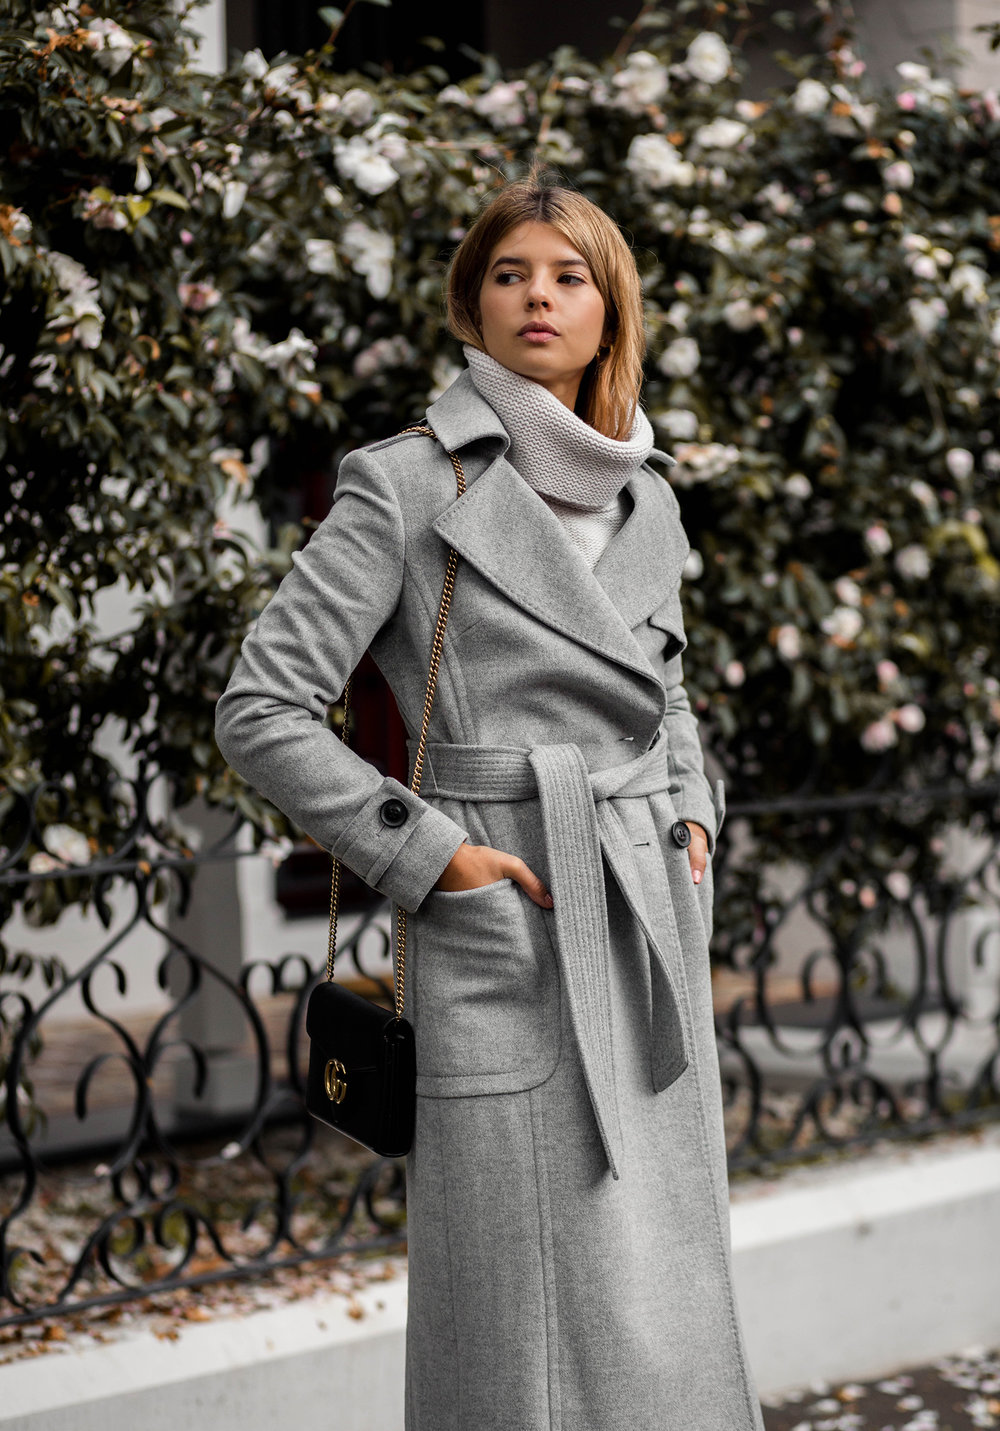 Grey On Grey... New Seasons Layers